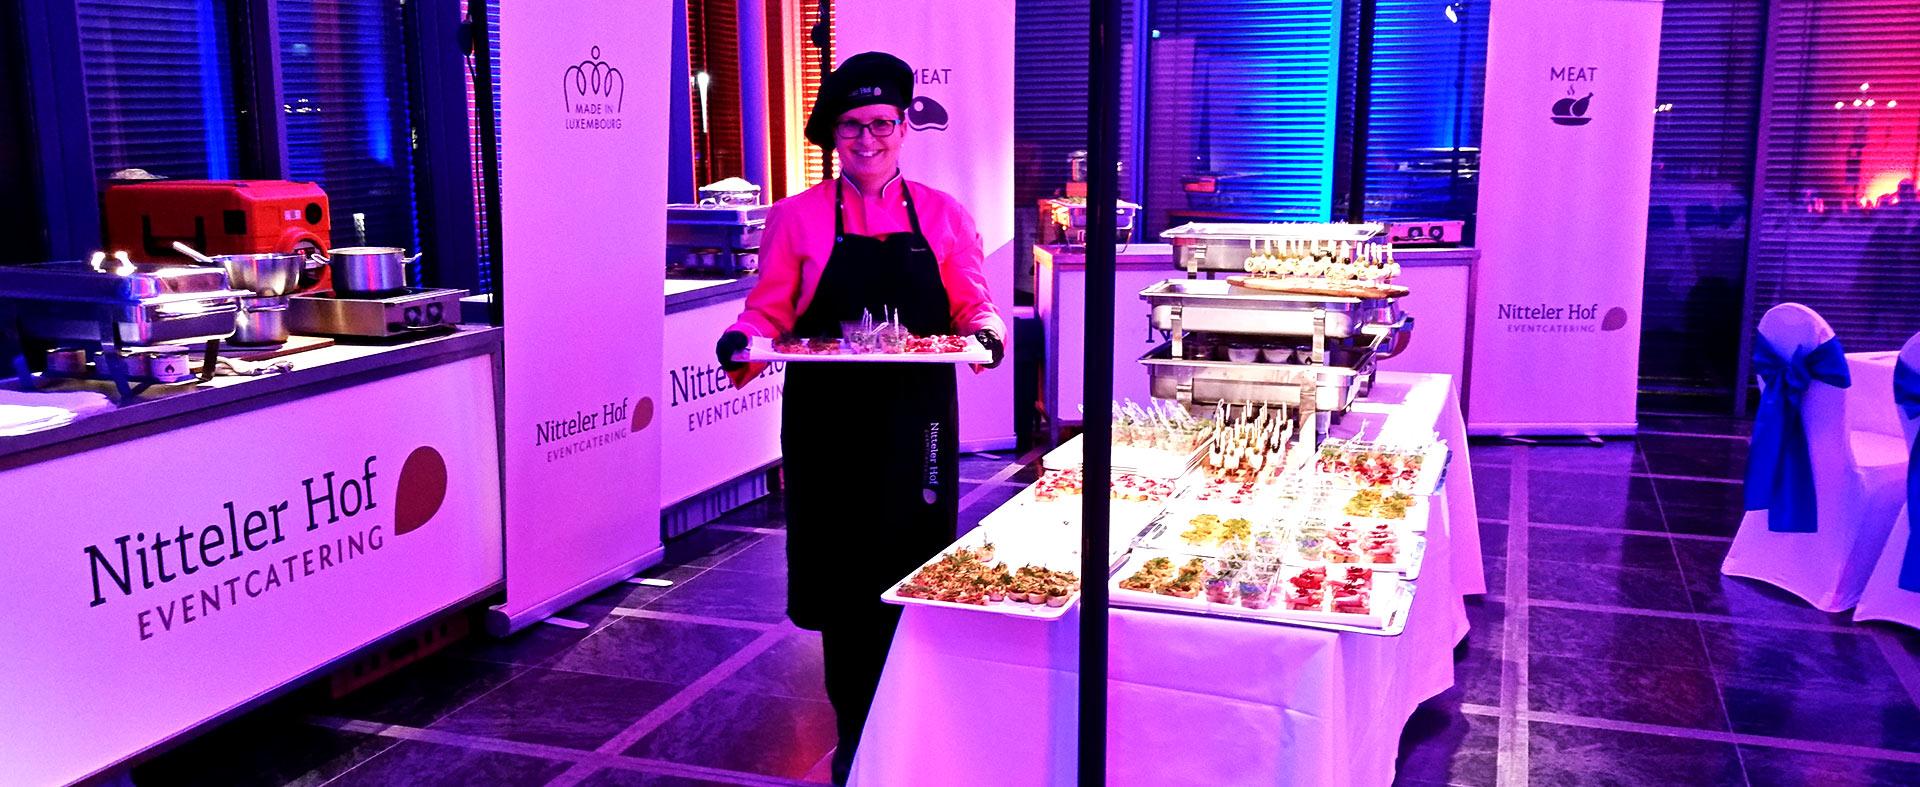 Live-Cooking Nitteler Hof Events